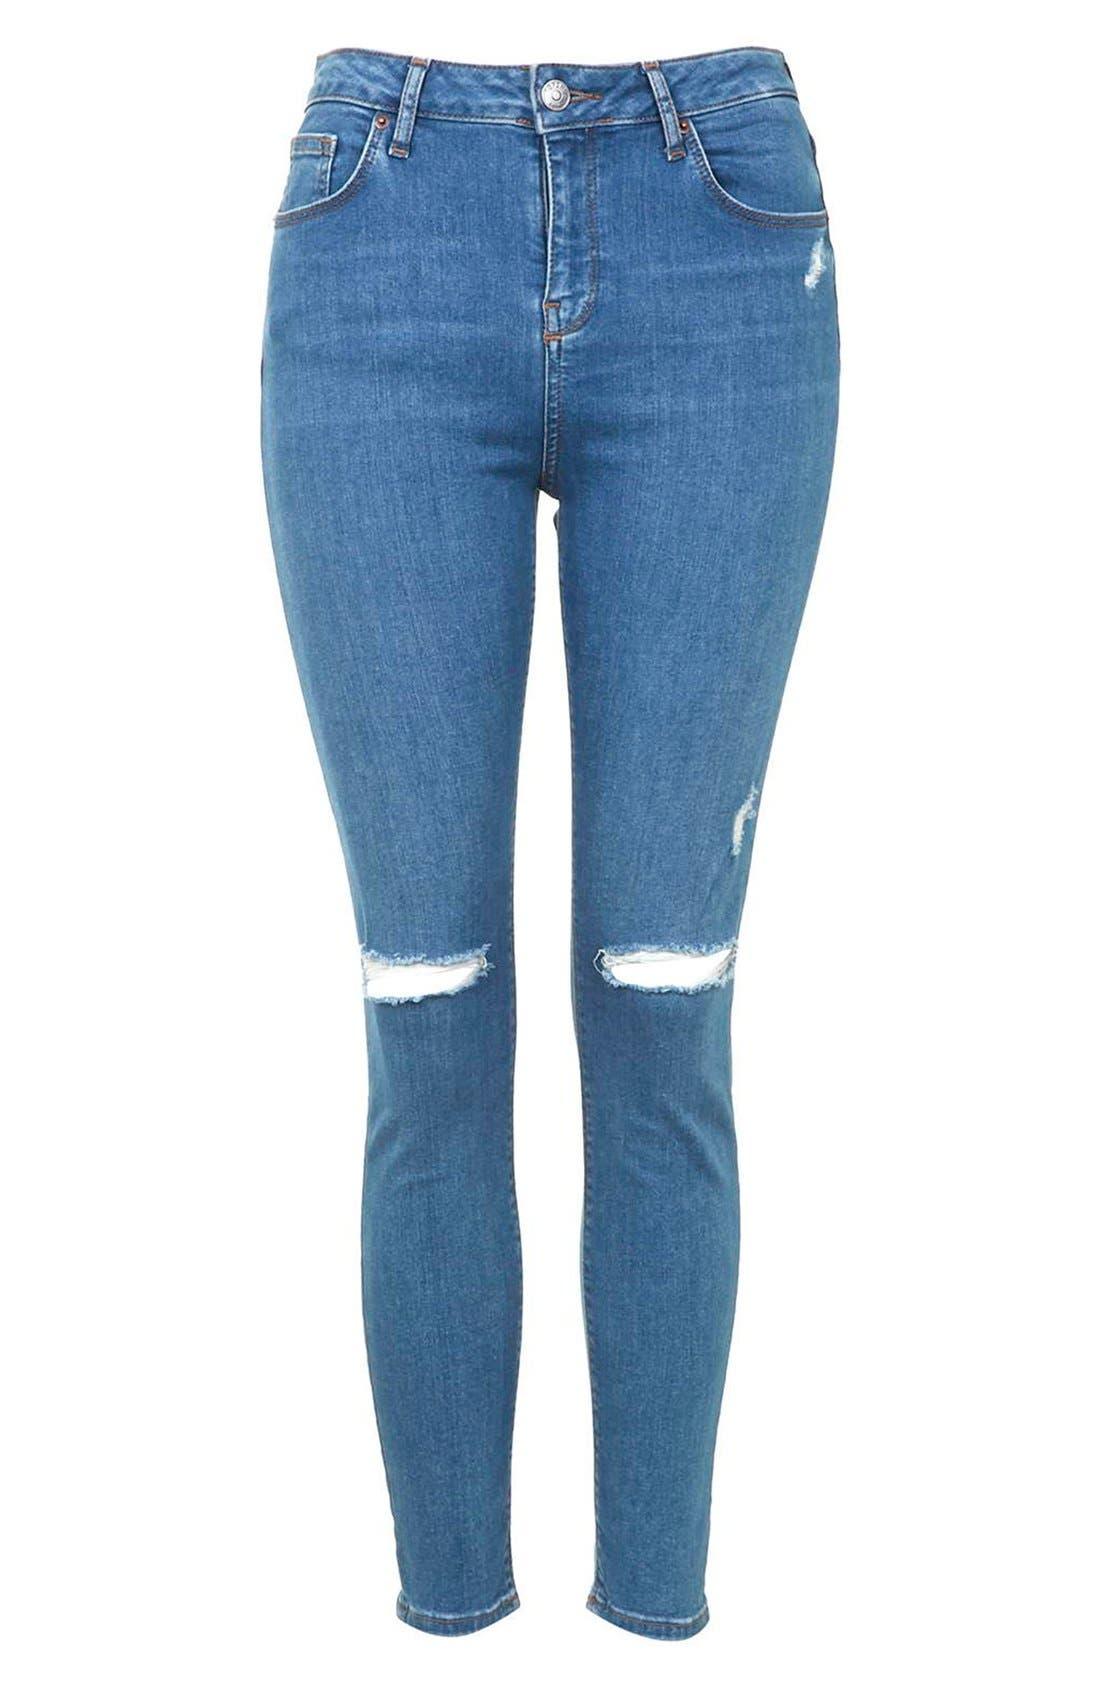 Alternate Image 3  - Topshop Moto 'Jamie' High Rise Skinny Jeans (Mid Denim) (Regular & Petite)